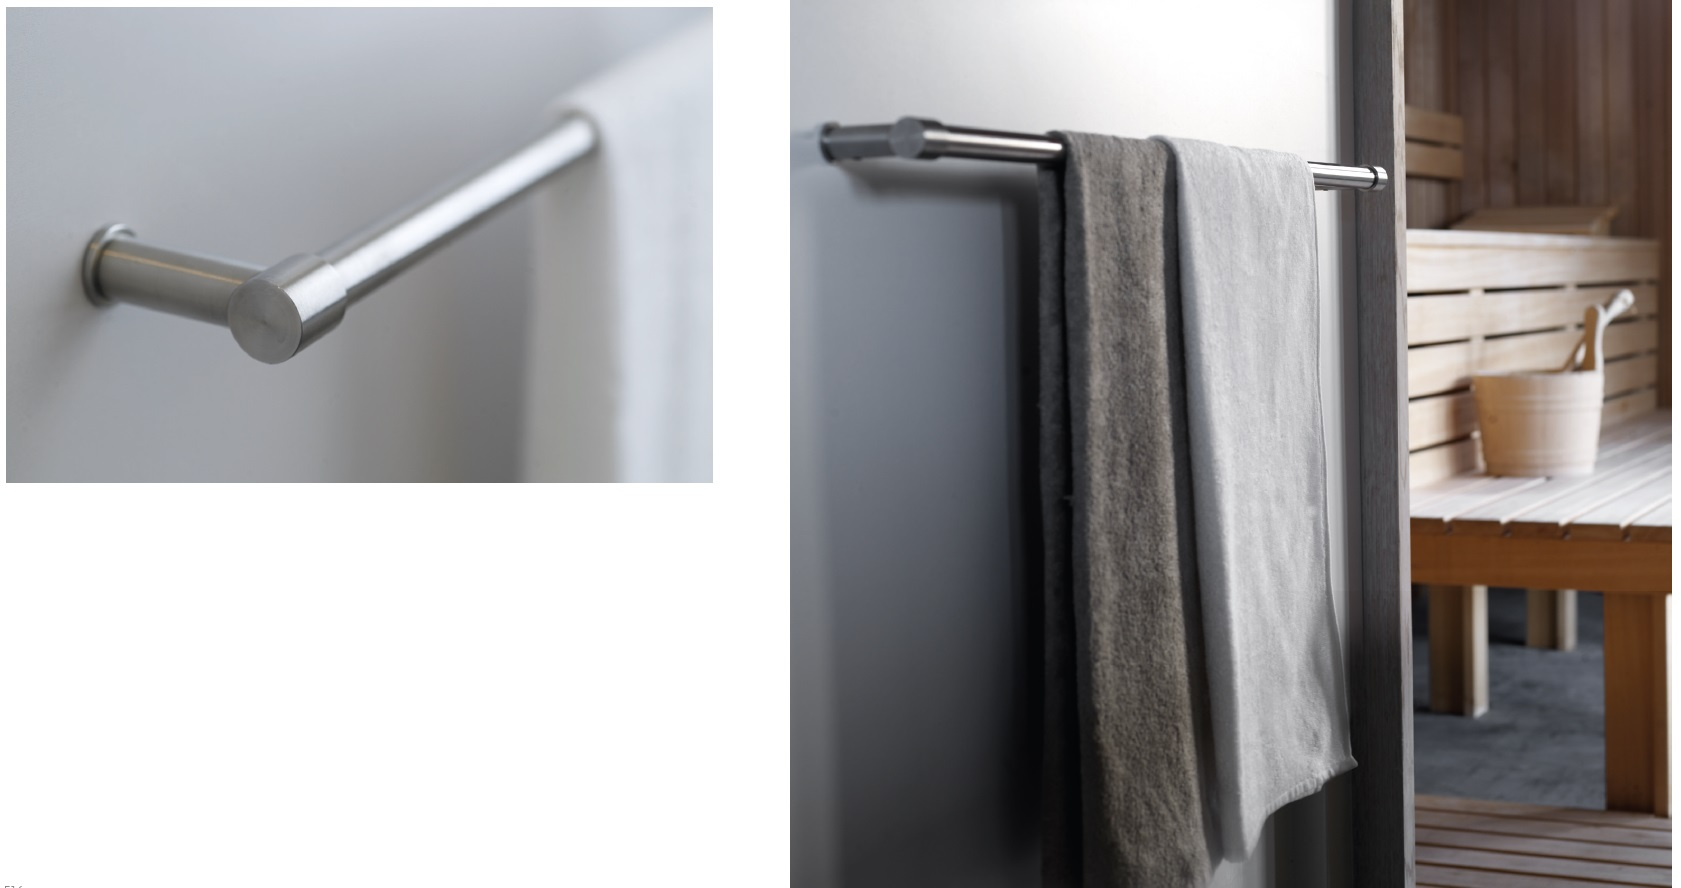 https://reimpex.lt/wp-content/uploads/2019/12/Bathware-2.jpg